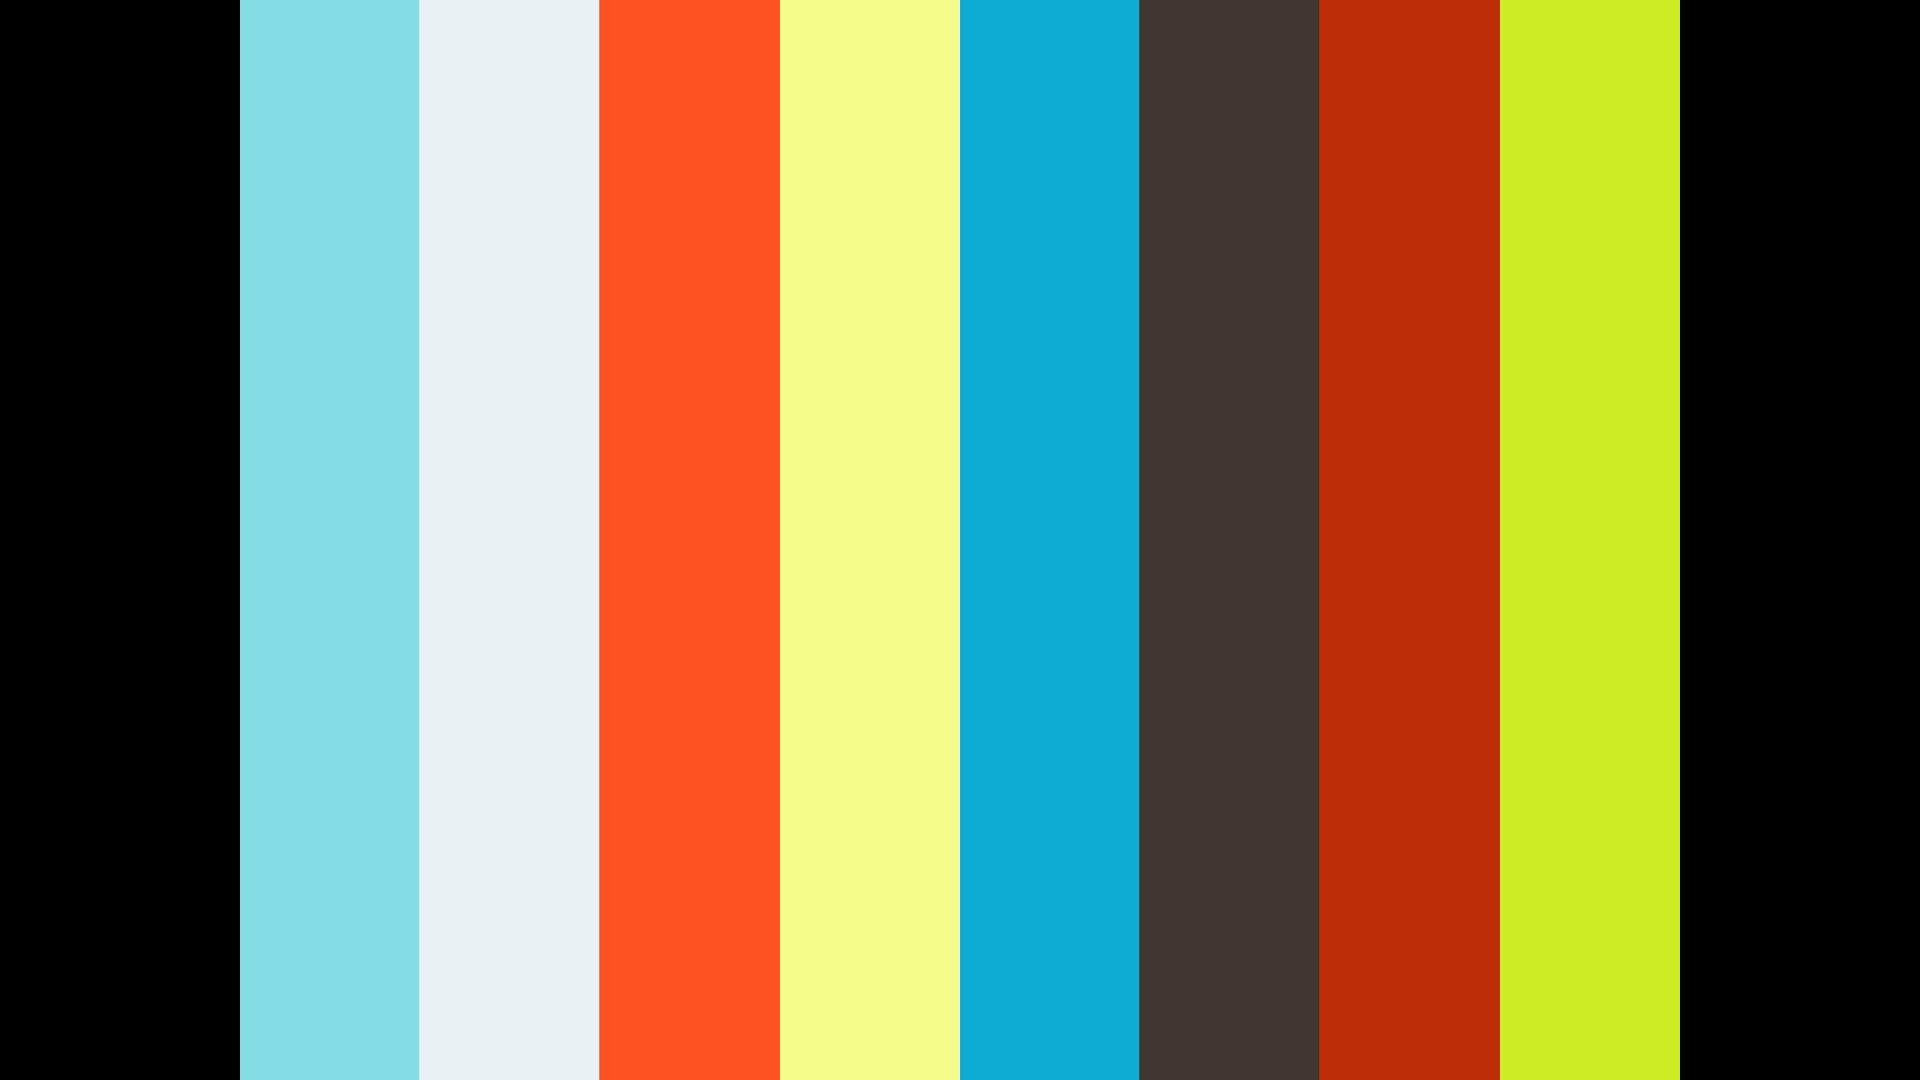 2020-02-16 ILOT TENIA - SKYVIEW-1